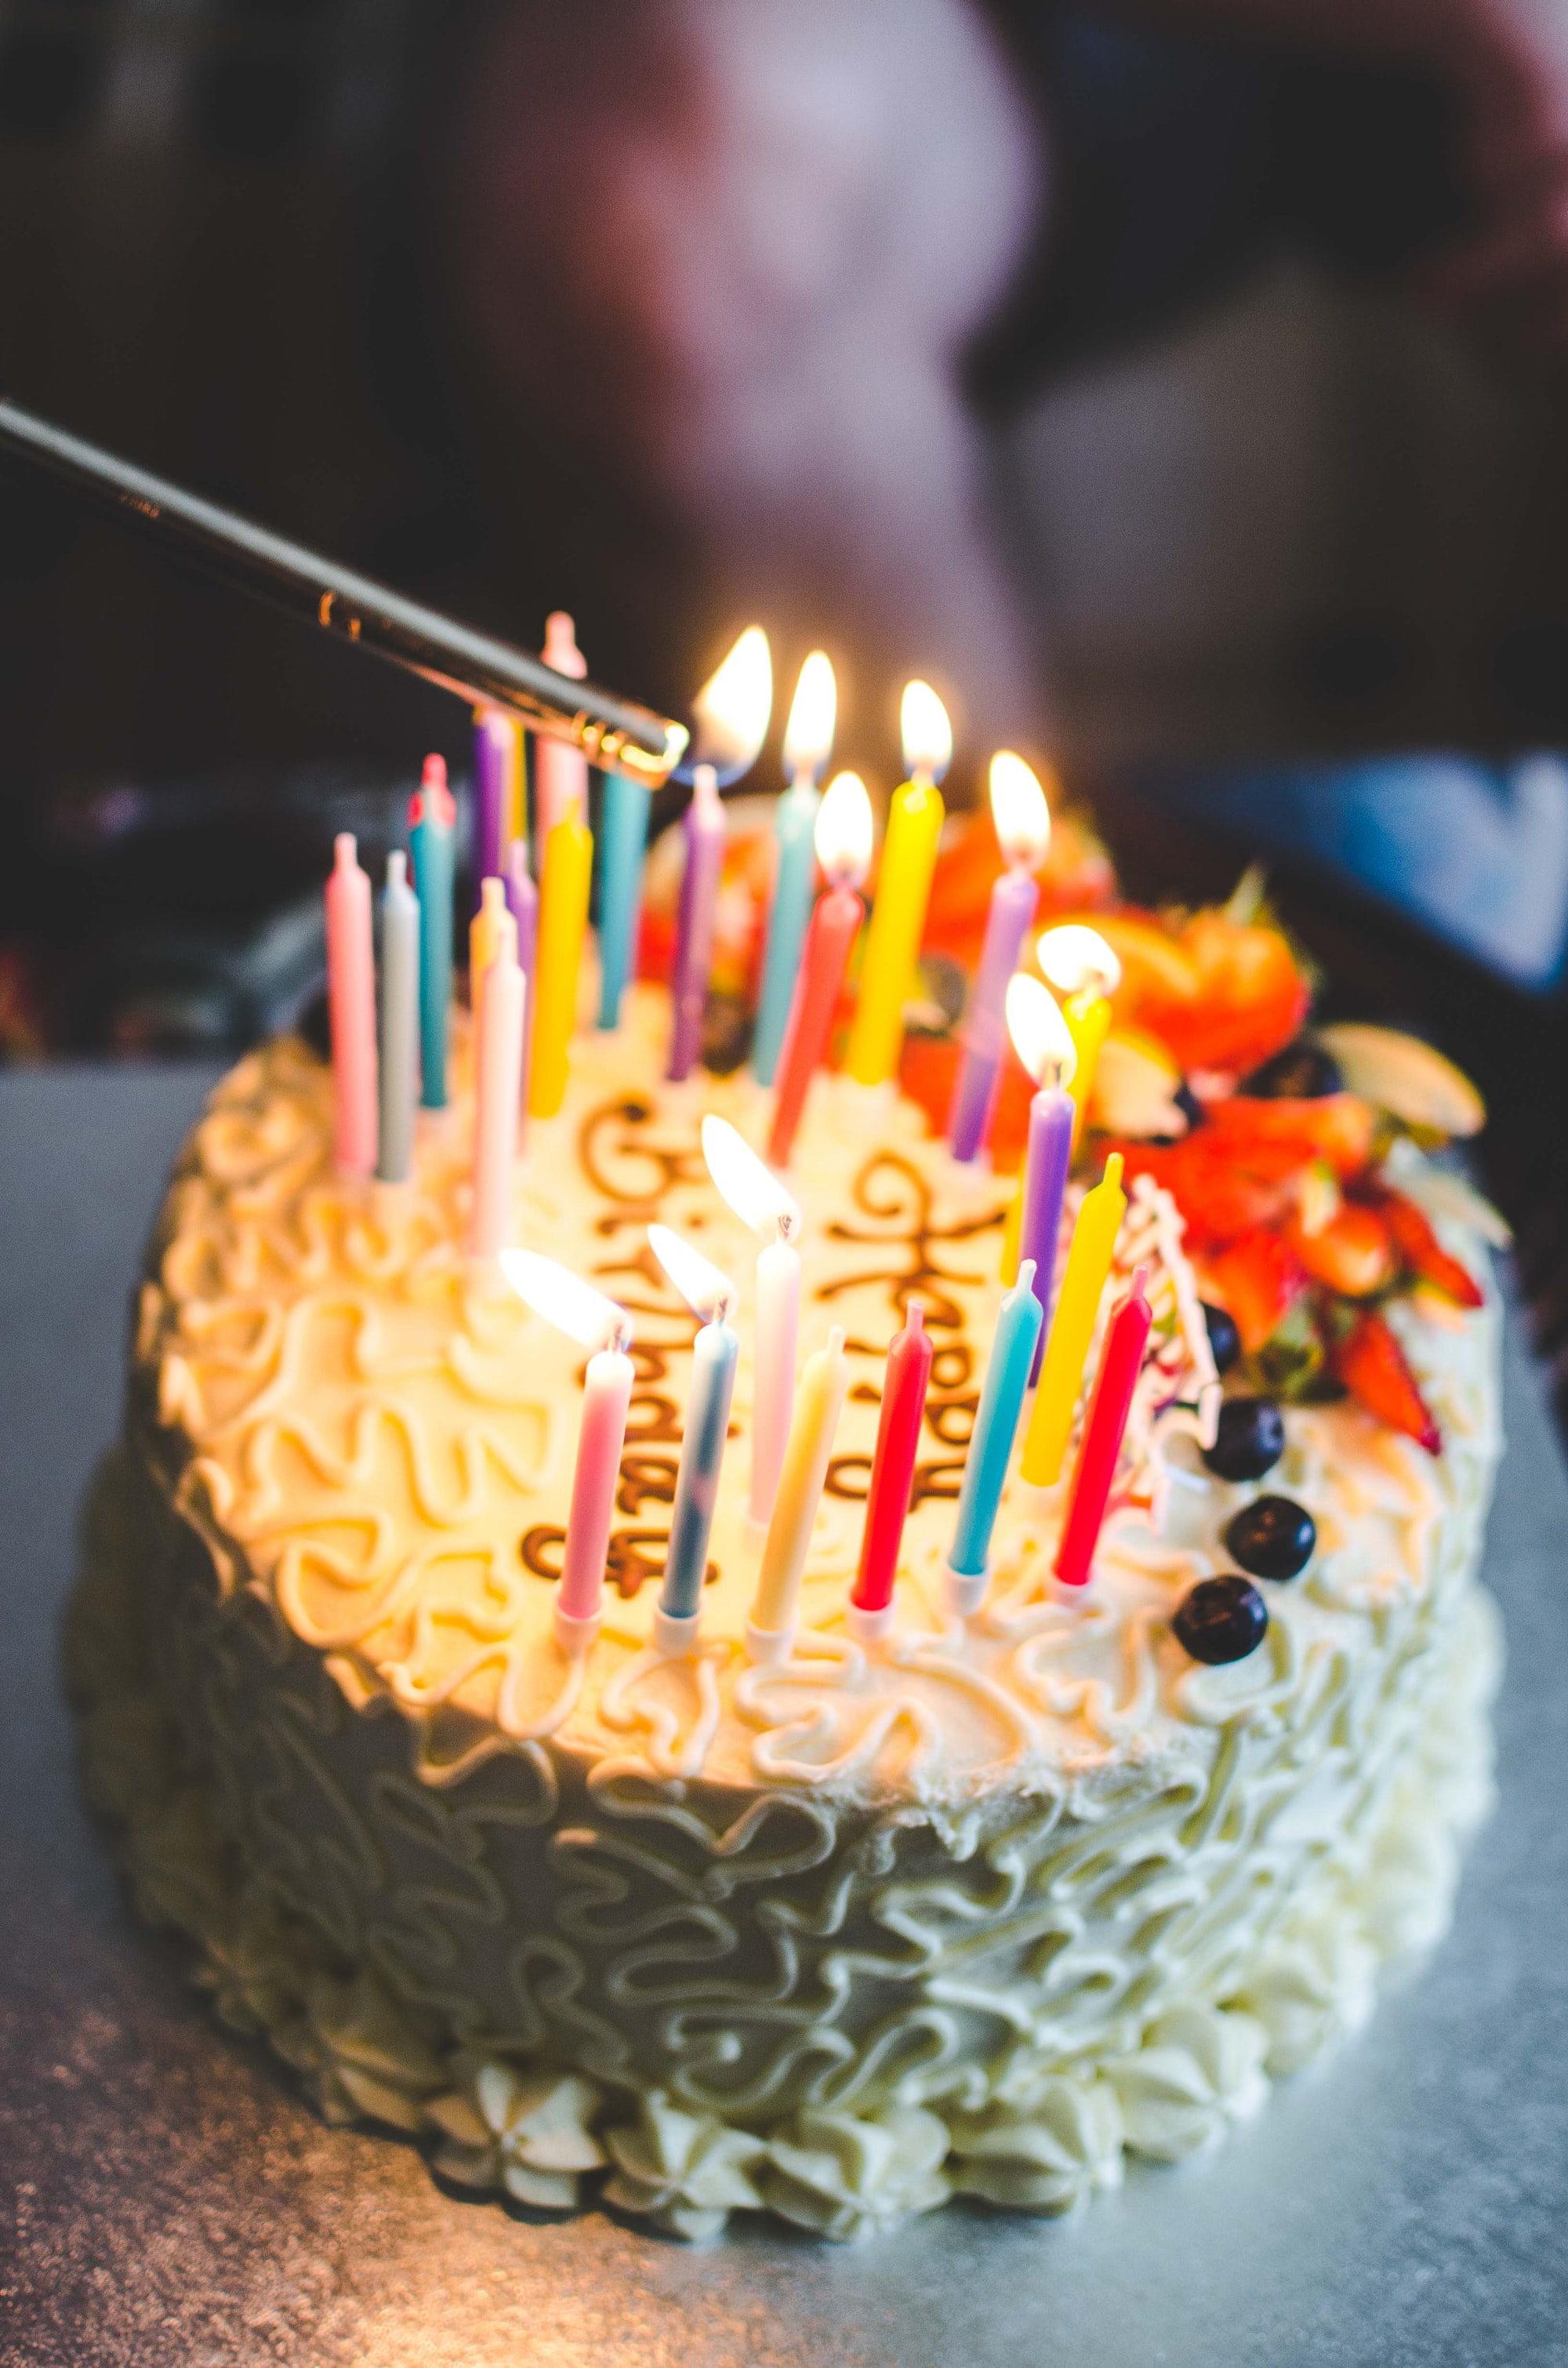 Hackerrank - Birthday Cake Candles Solution